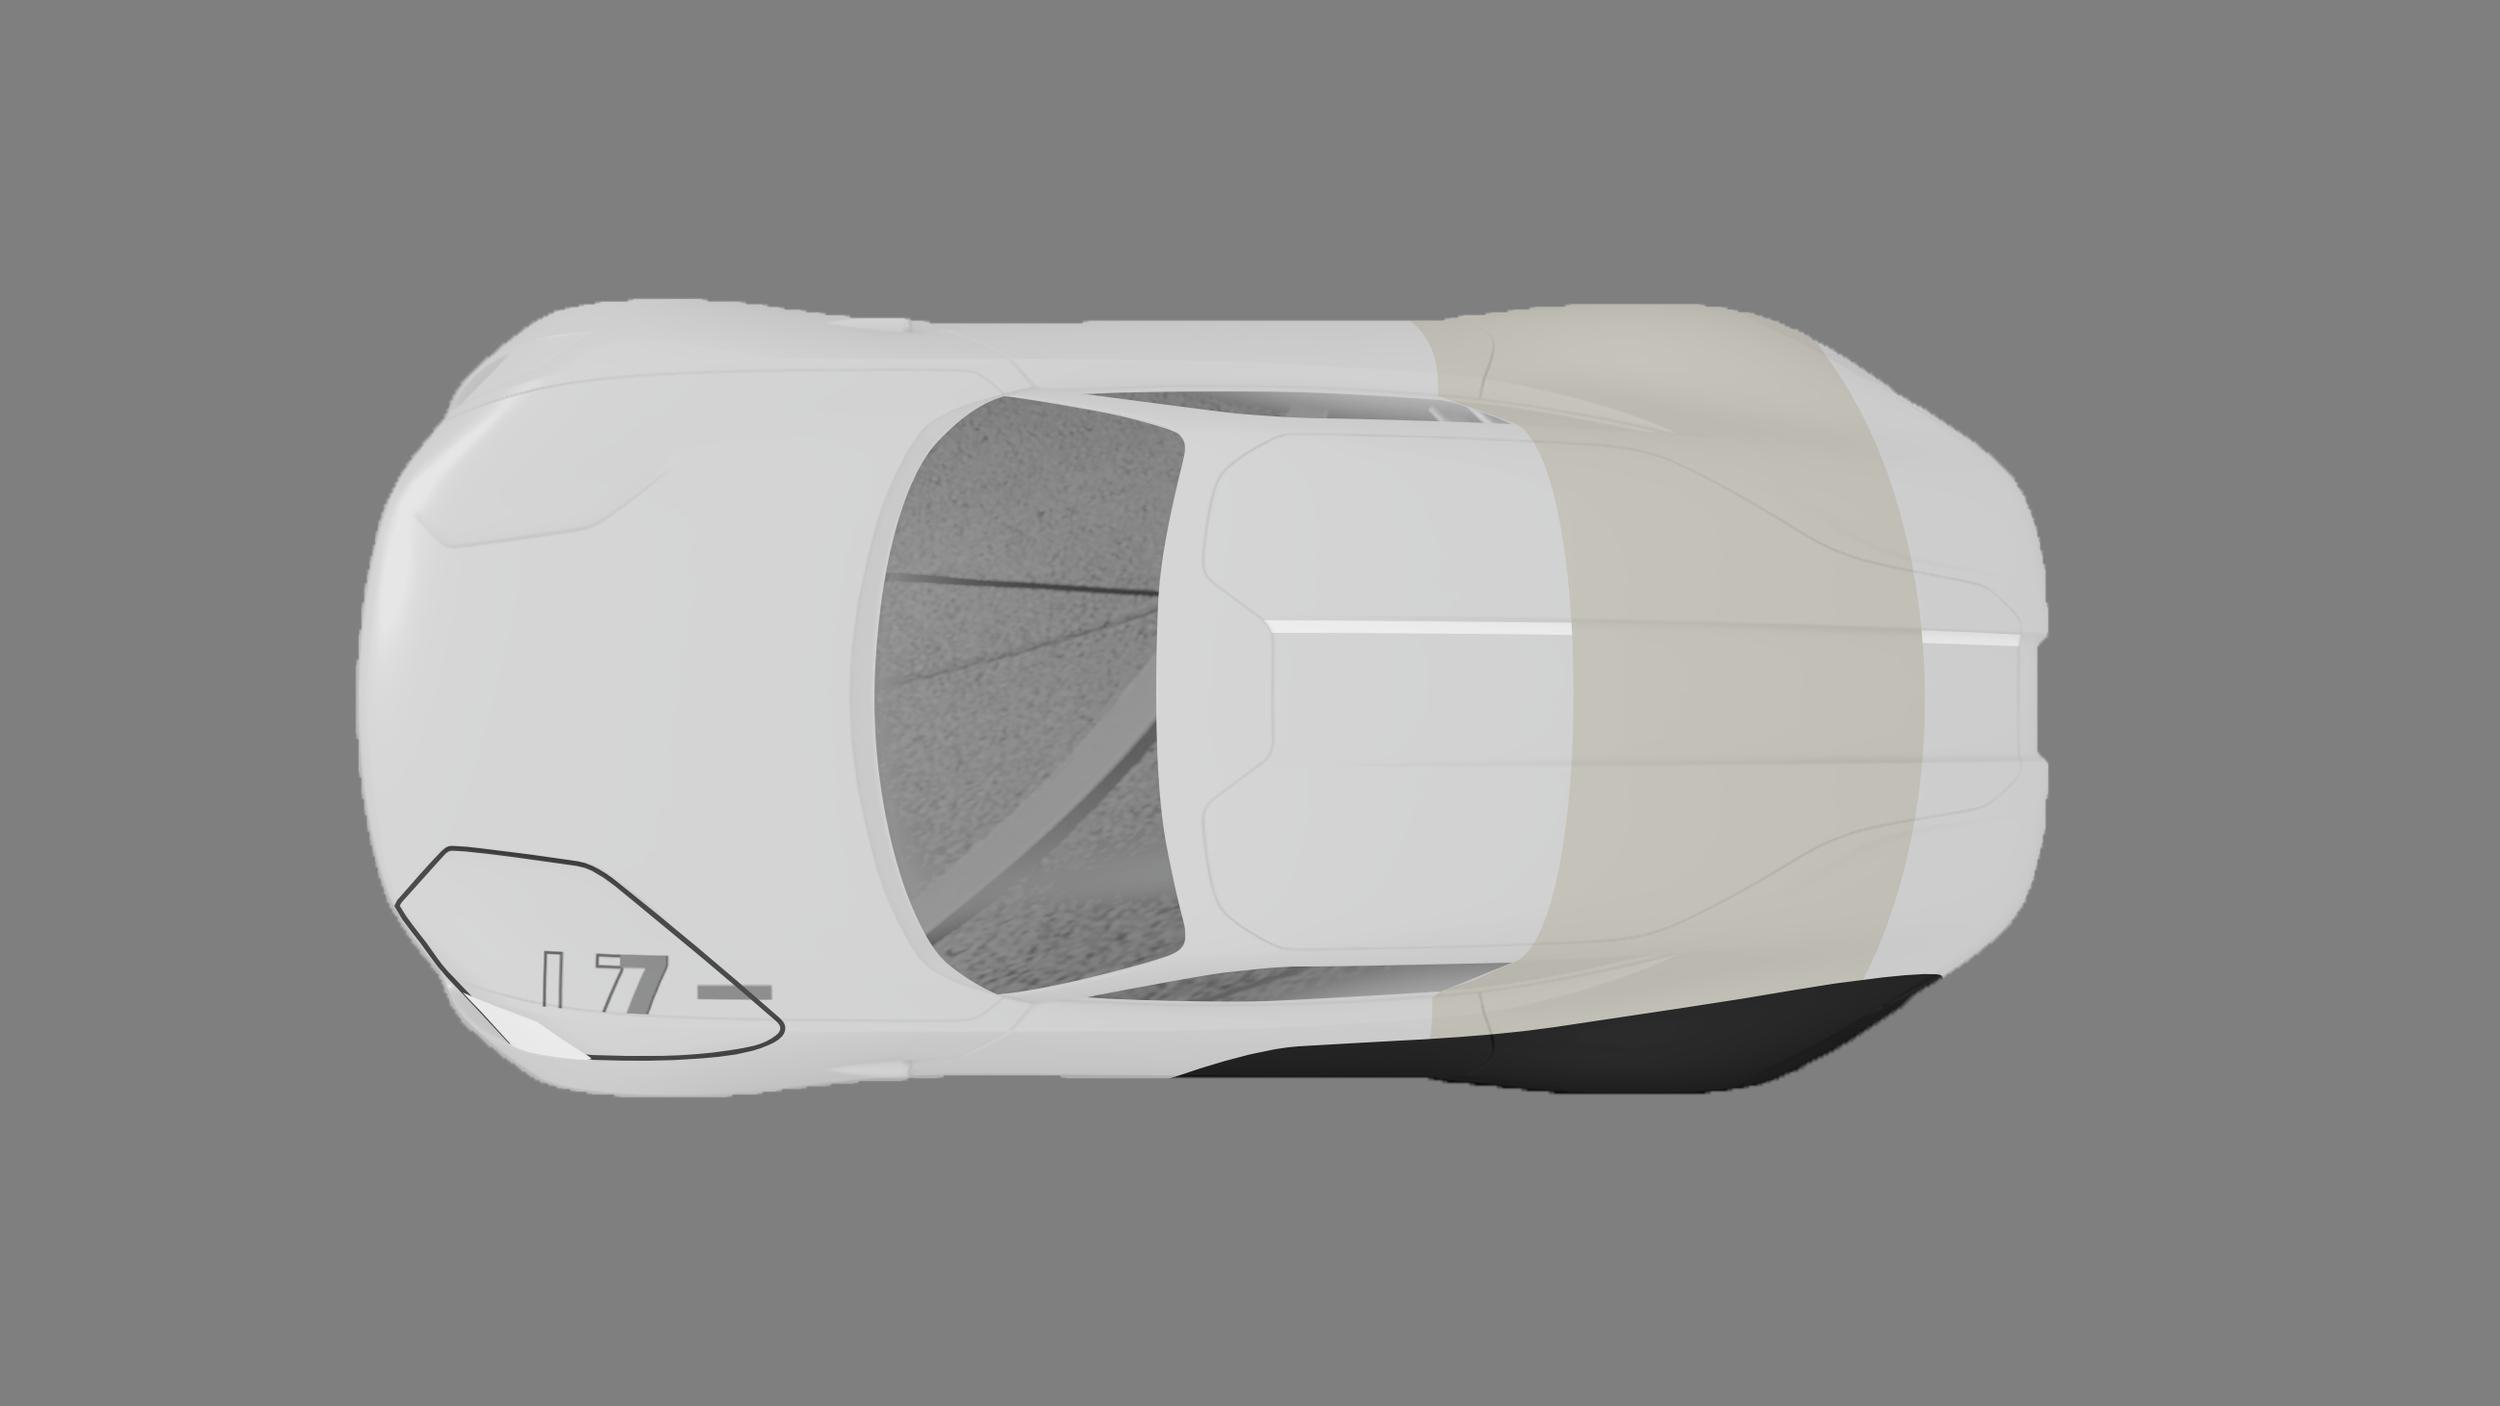 thomas charier xtaon contest concept car sketch design top